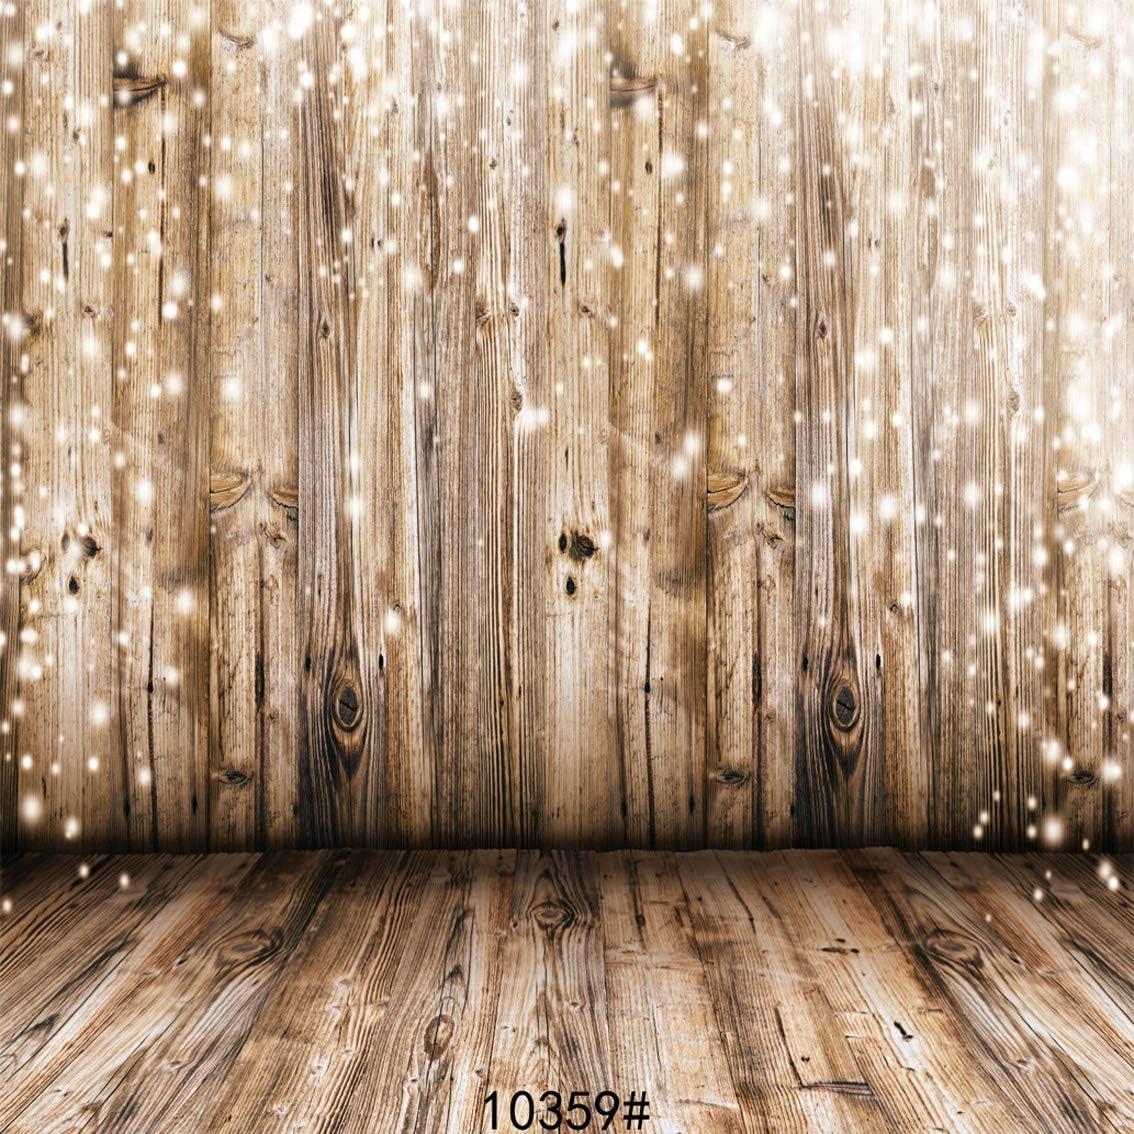 GoEoo 5X7ft Christmas Vinyl Cloth Photo Backdrops Customized Studio Background Studio Props JLT10289